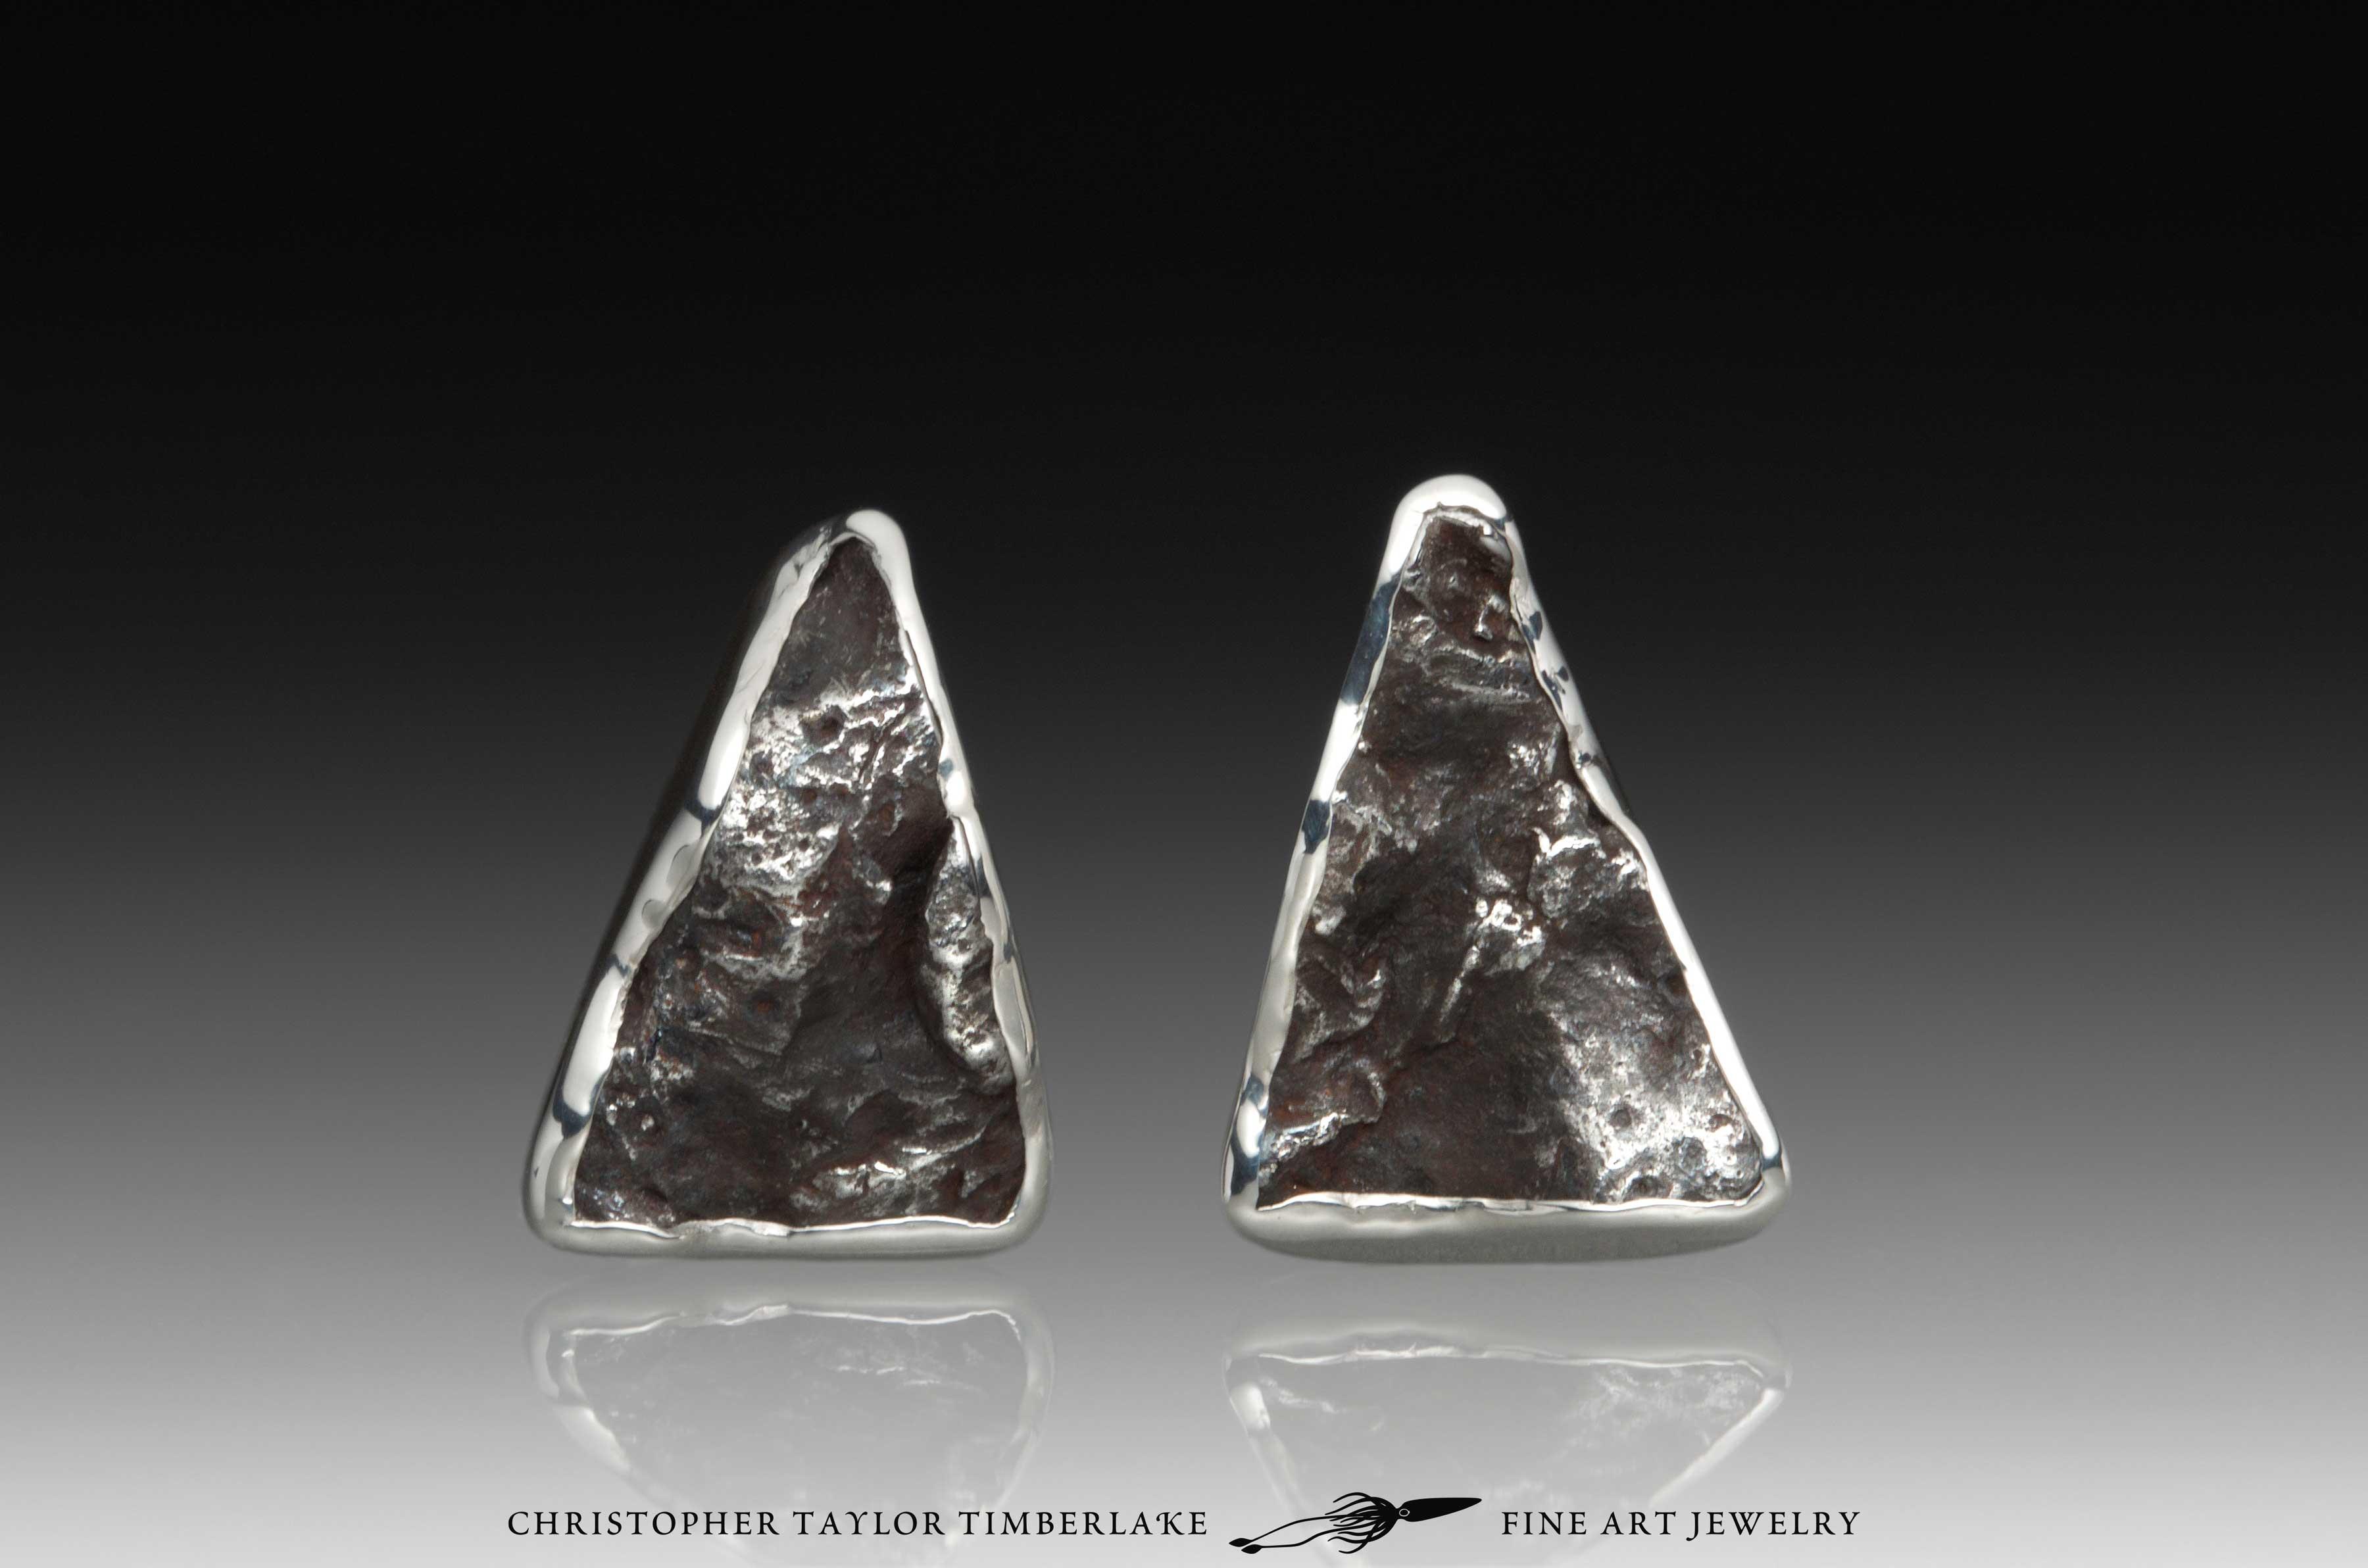 Hubble-Sterling-Silver-Triangle-Sikhote-Alin-Cufflinks-1